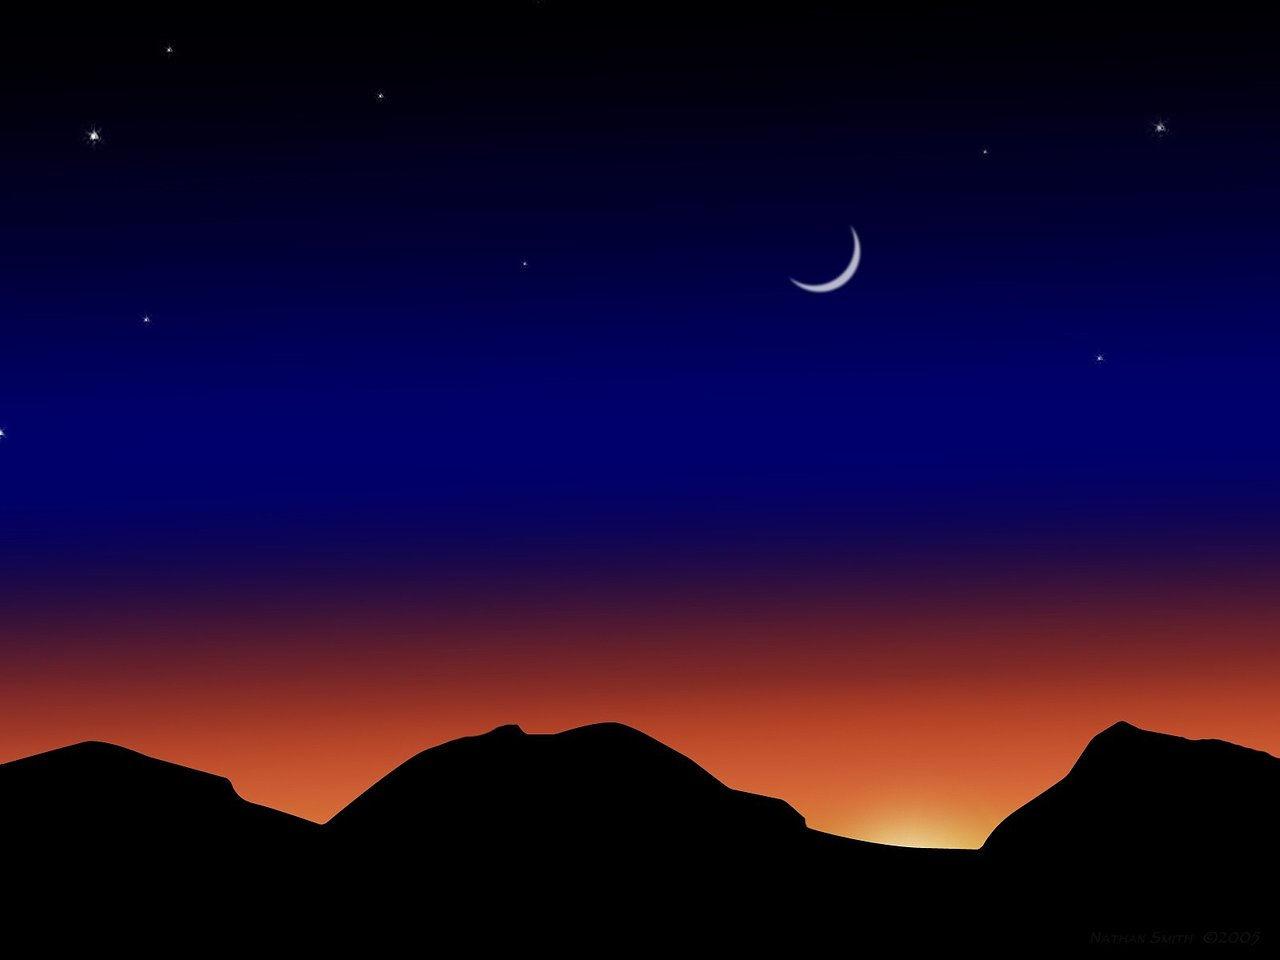 ws_Sunset_Mountains_1600x1200.jpg